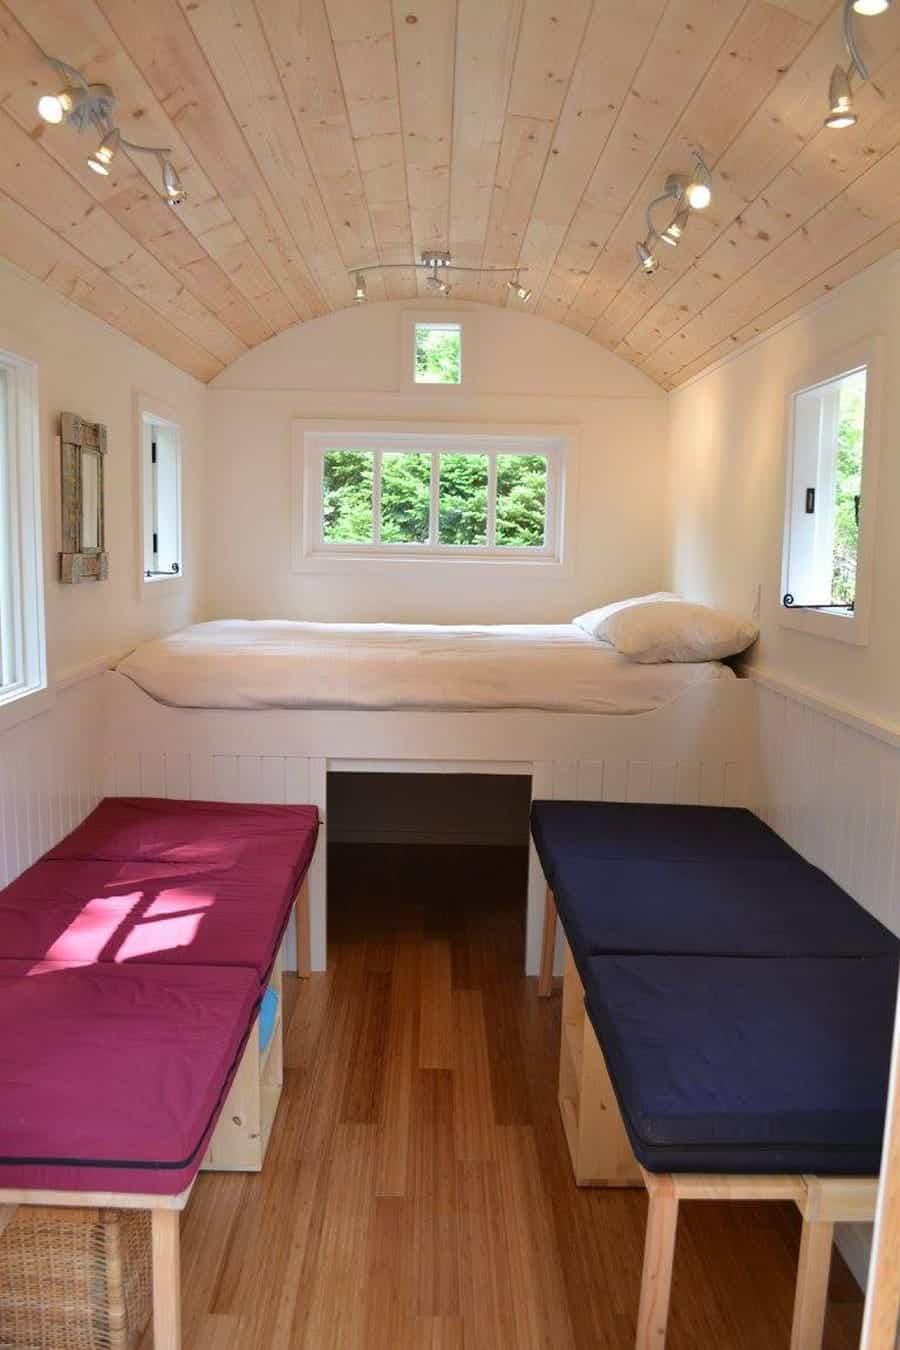 i want sleep_Minimalist Simplicity Done Right - The Hornby Caravan